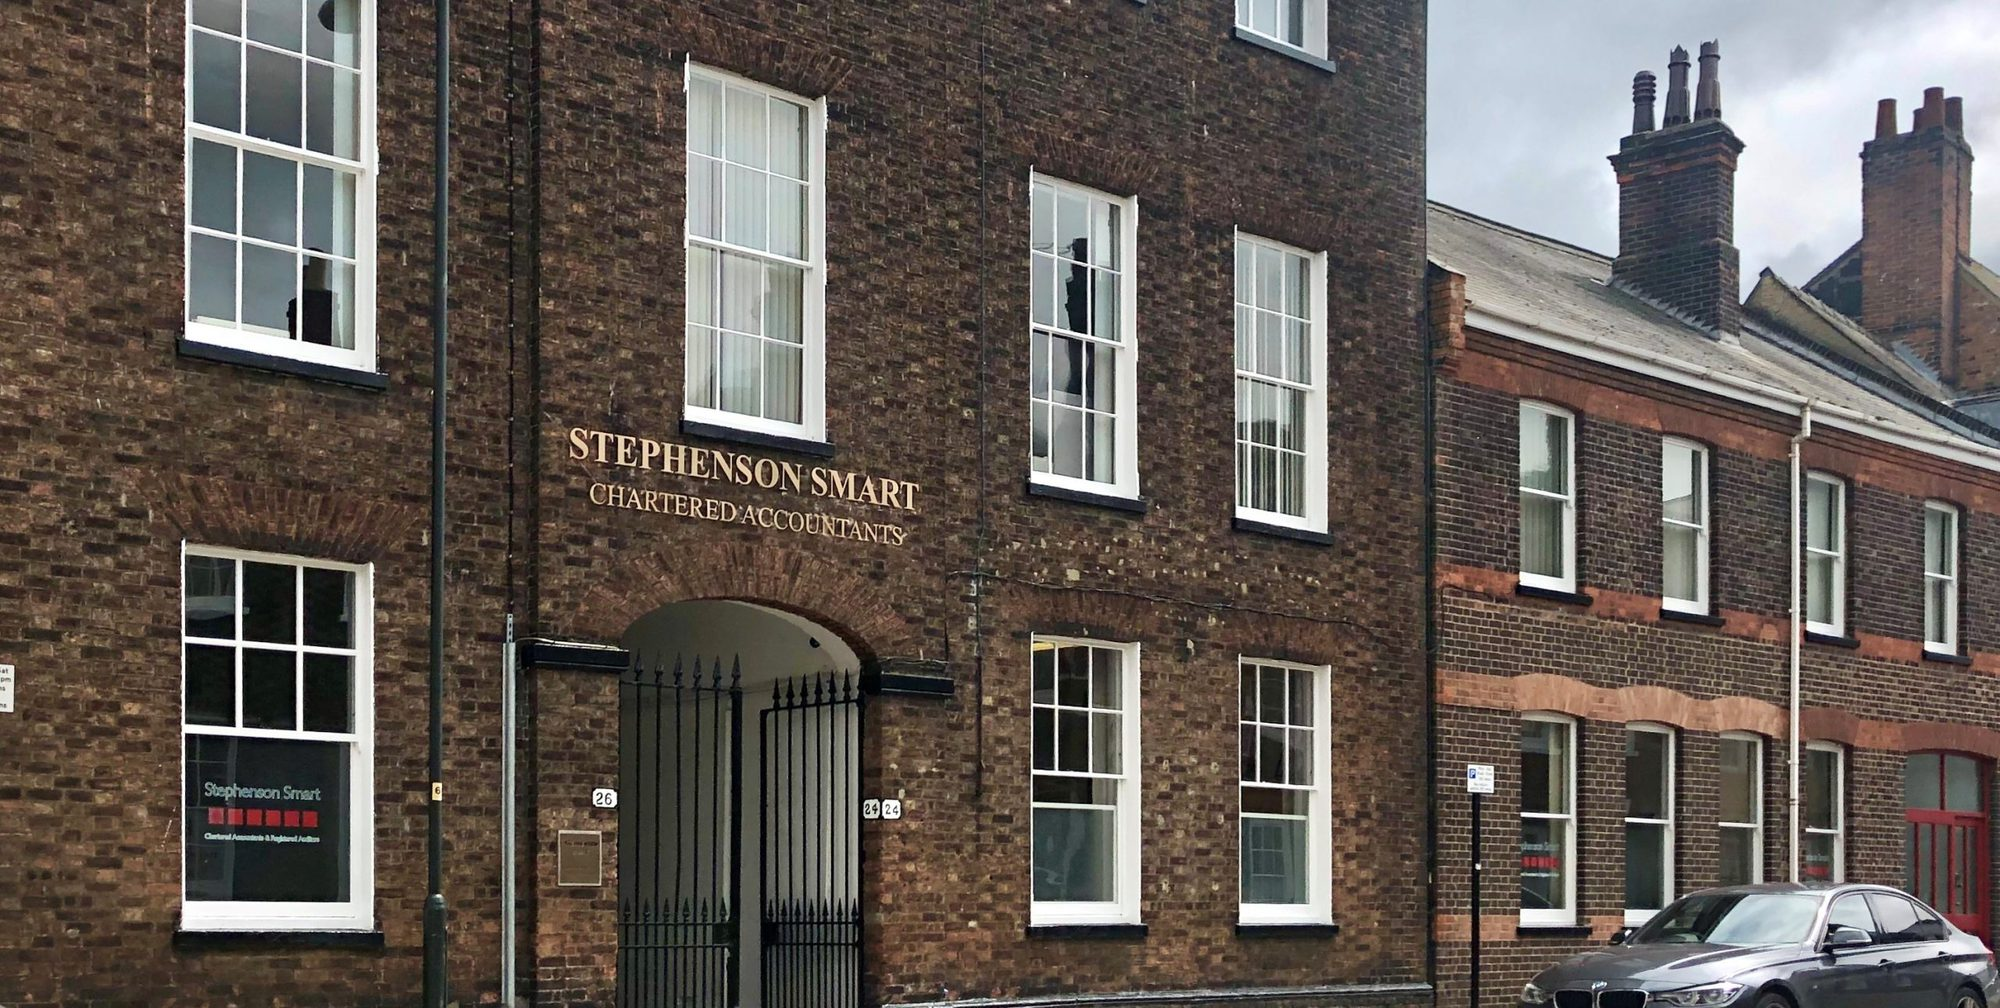 Stephenson Smart Kings Lynn